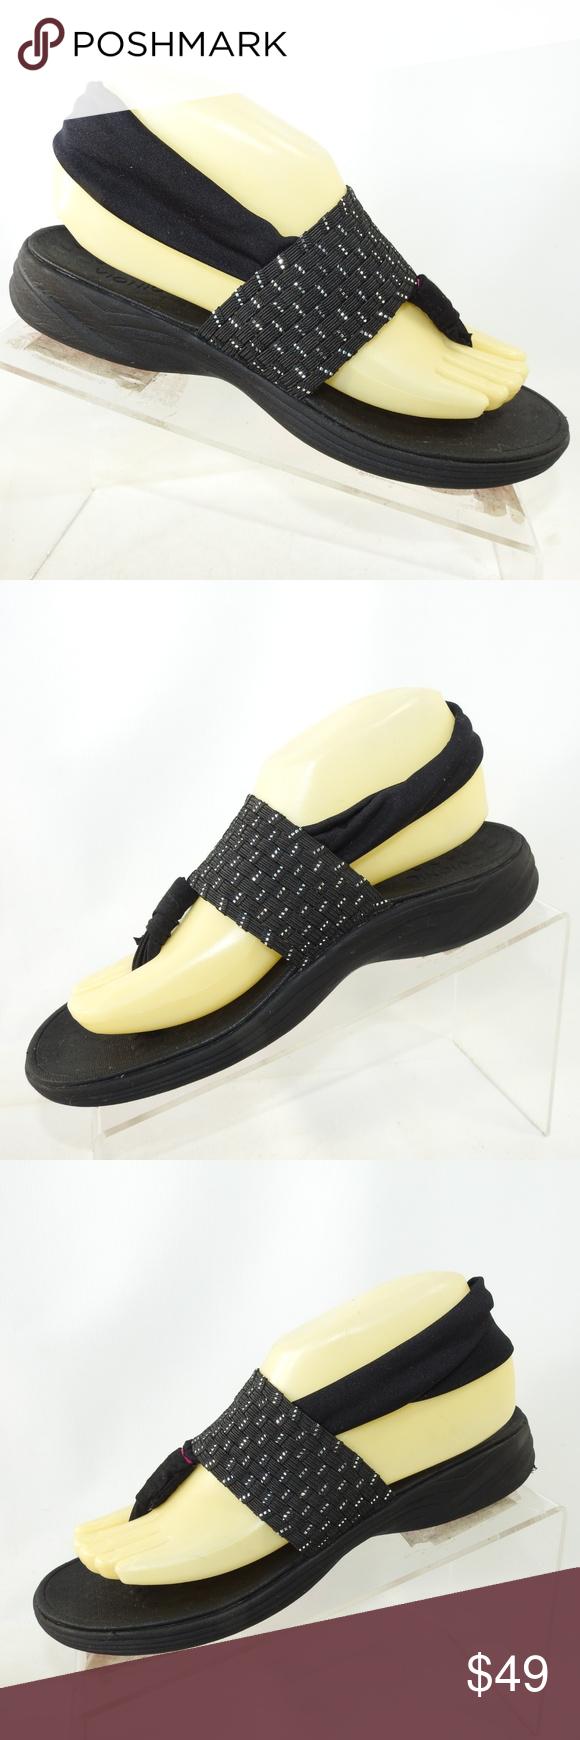 93af77c6db9c Vionic Serene Tia Size 7 Sandals Shoes For Women Vionic Serene Tia Sz 7 M  Black Textile Sling Back Thong Sandals Shoes For Women Please note that  many of ...